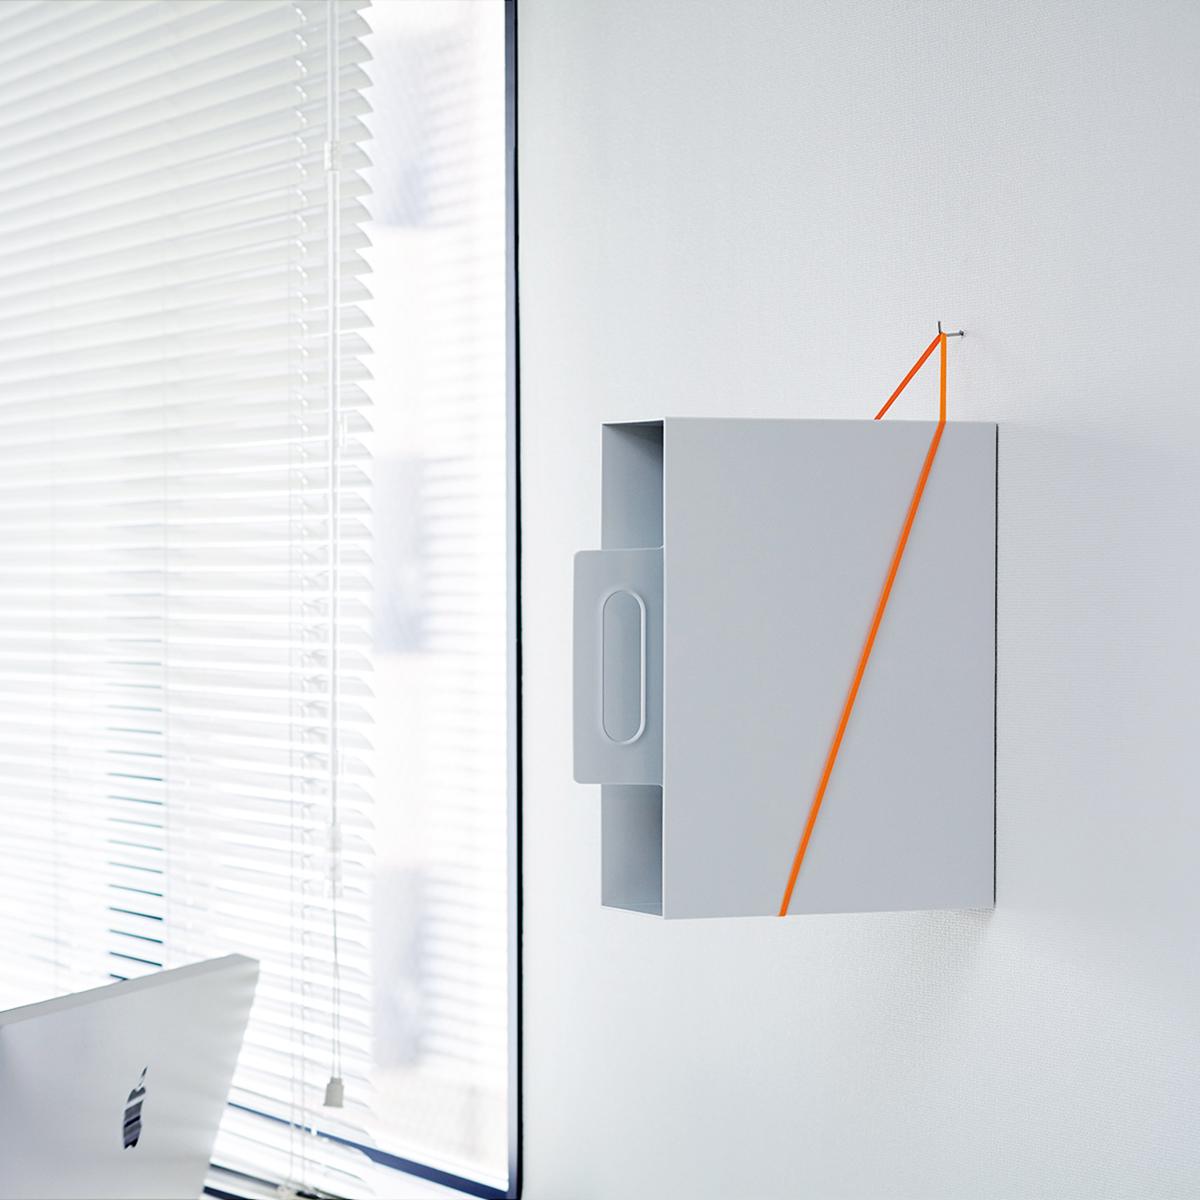 【 SOFT LOOP SHELF 2セット入 】ひもで壁にモノを置くループ状のシェルフ?